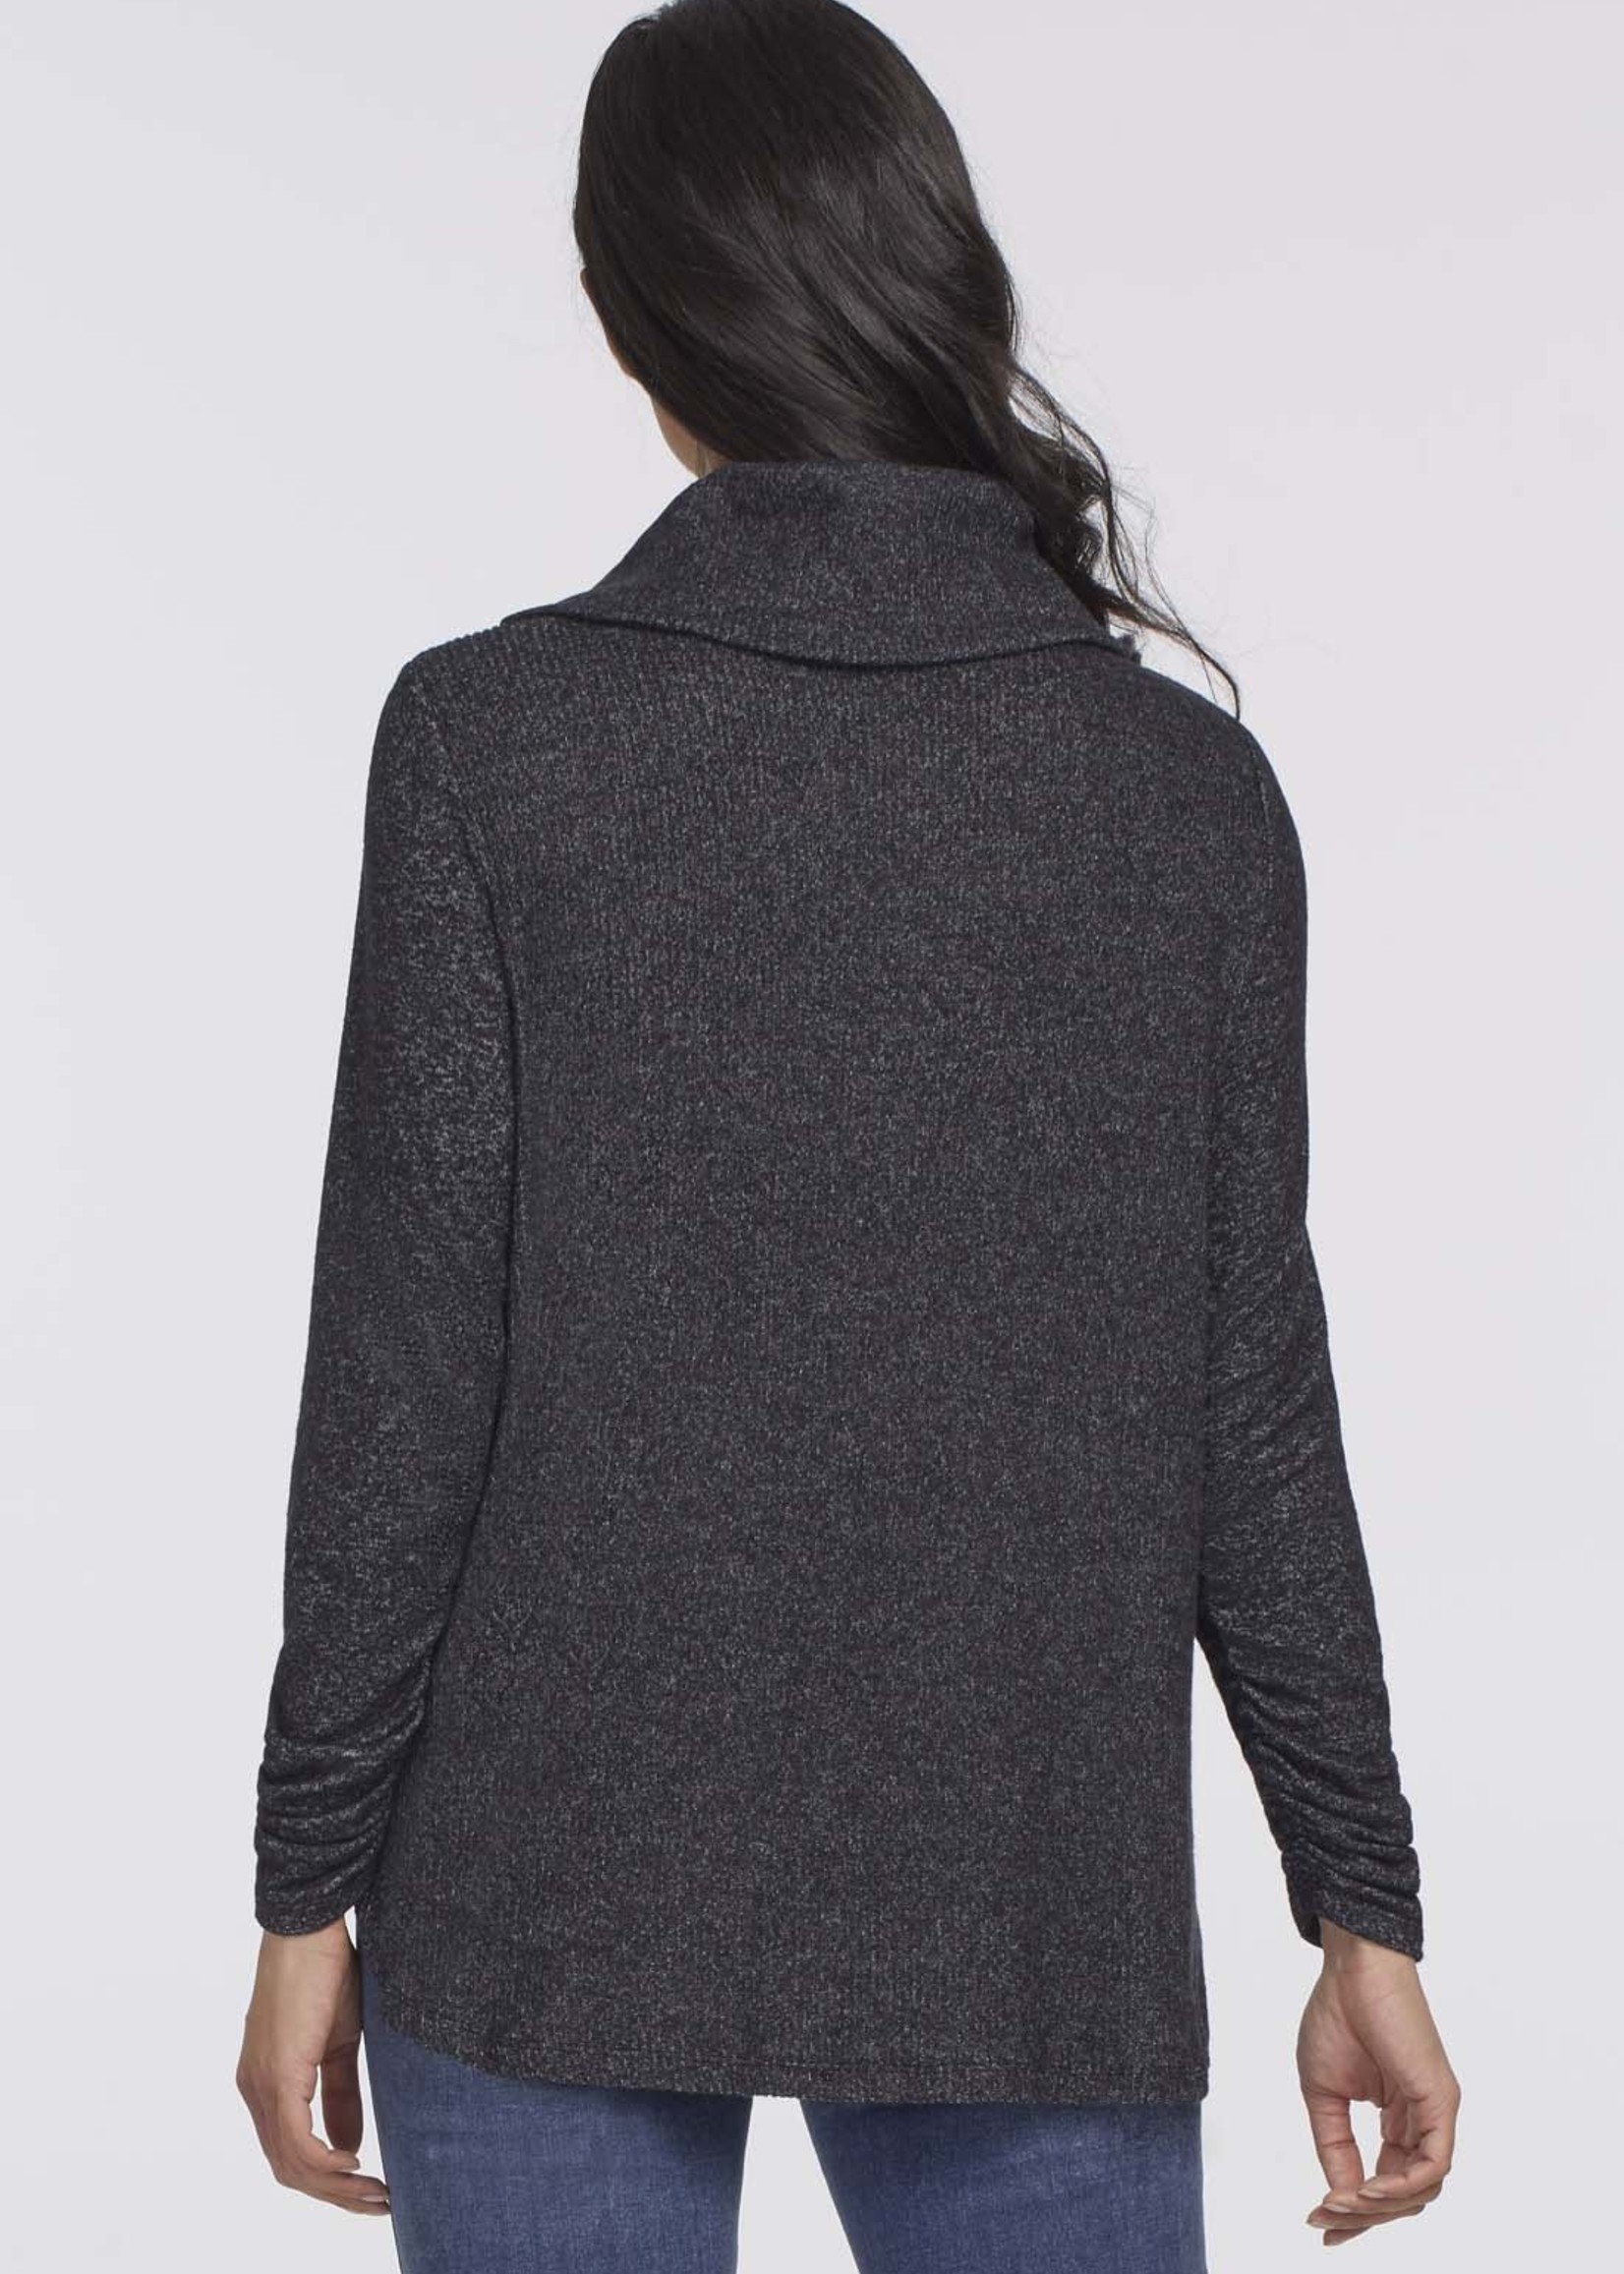 Tribal Tribal  Cowl Neck Sweater w/ Shirring Details  Black